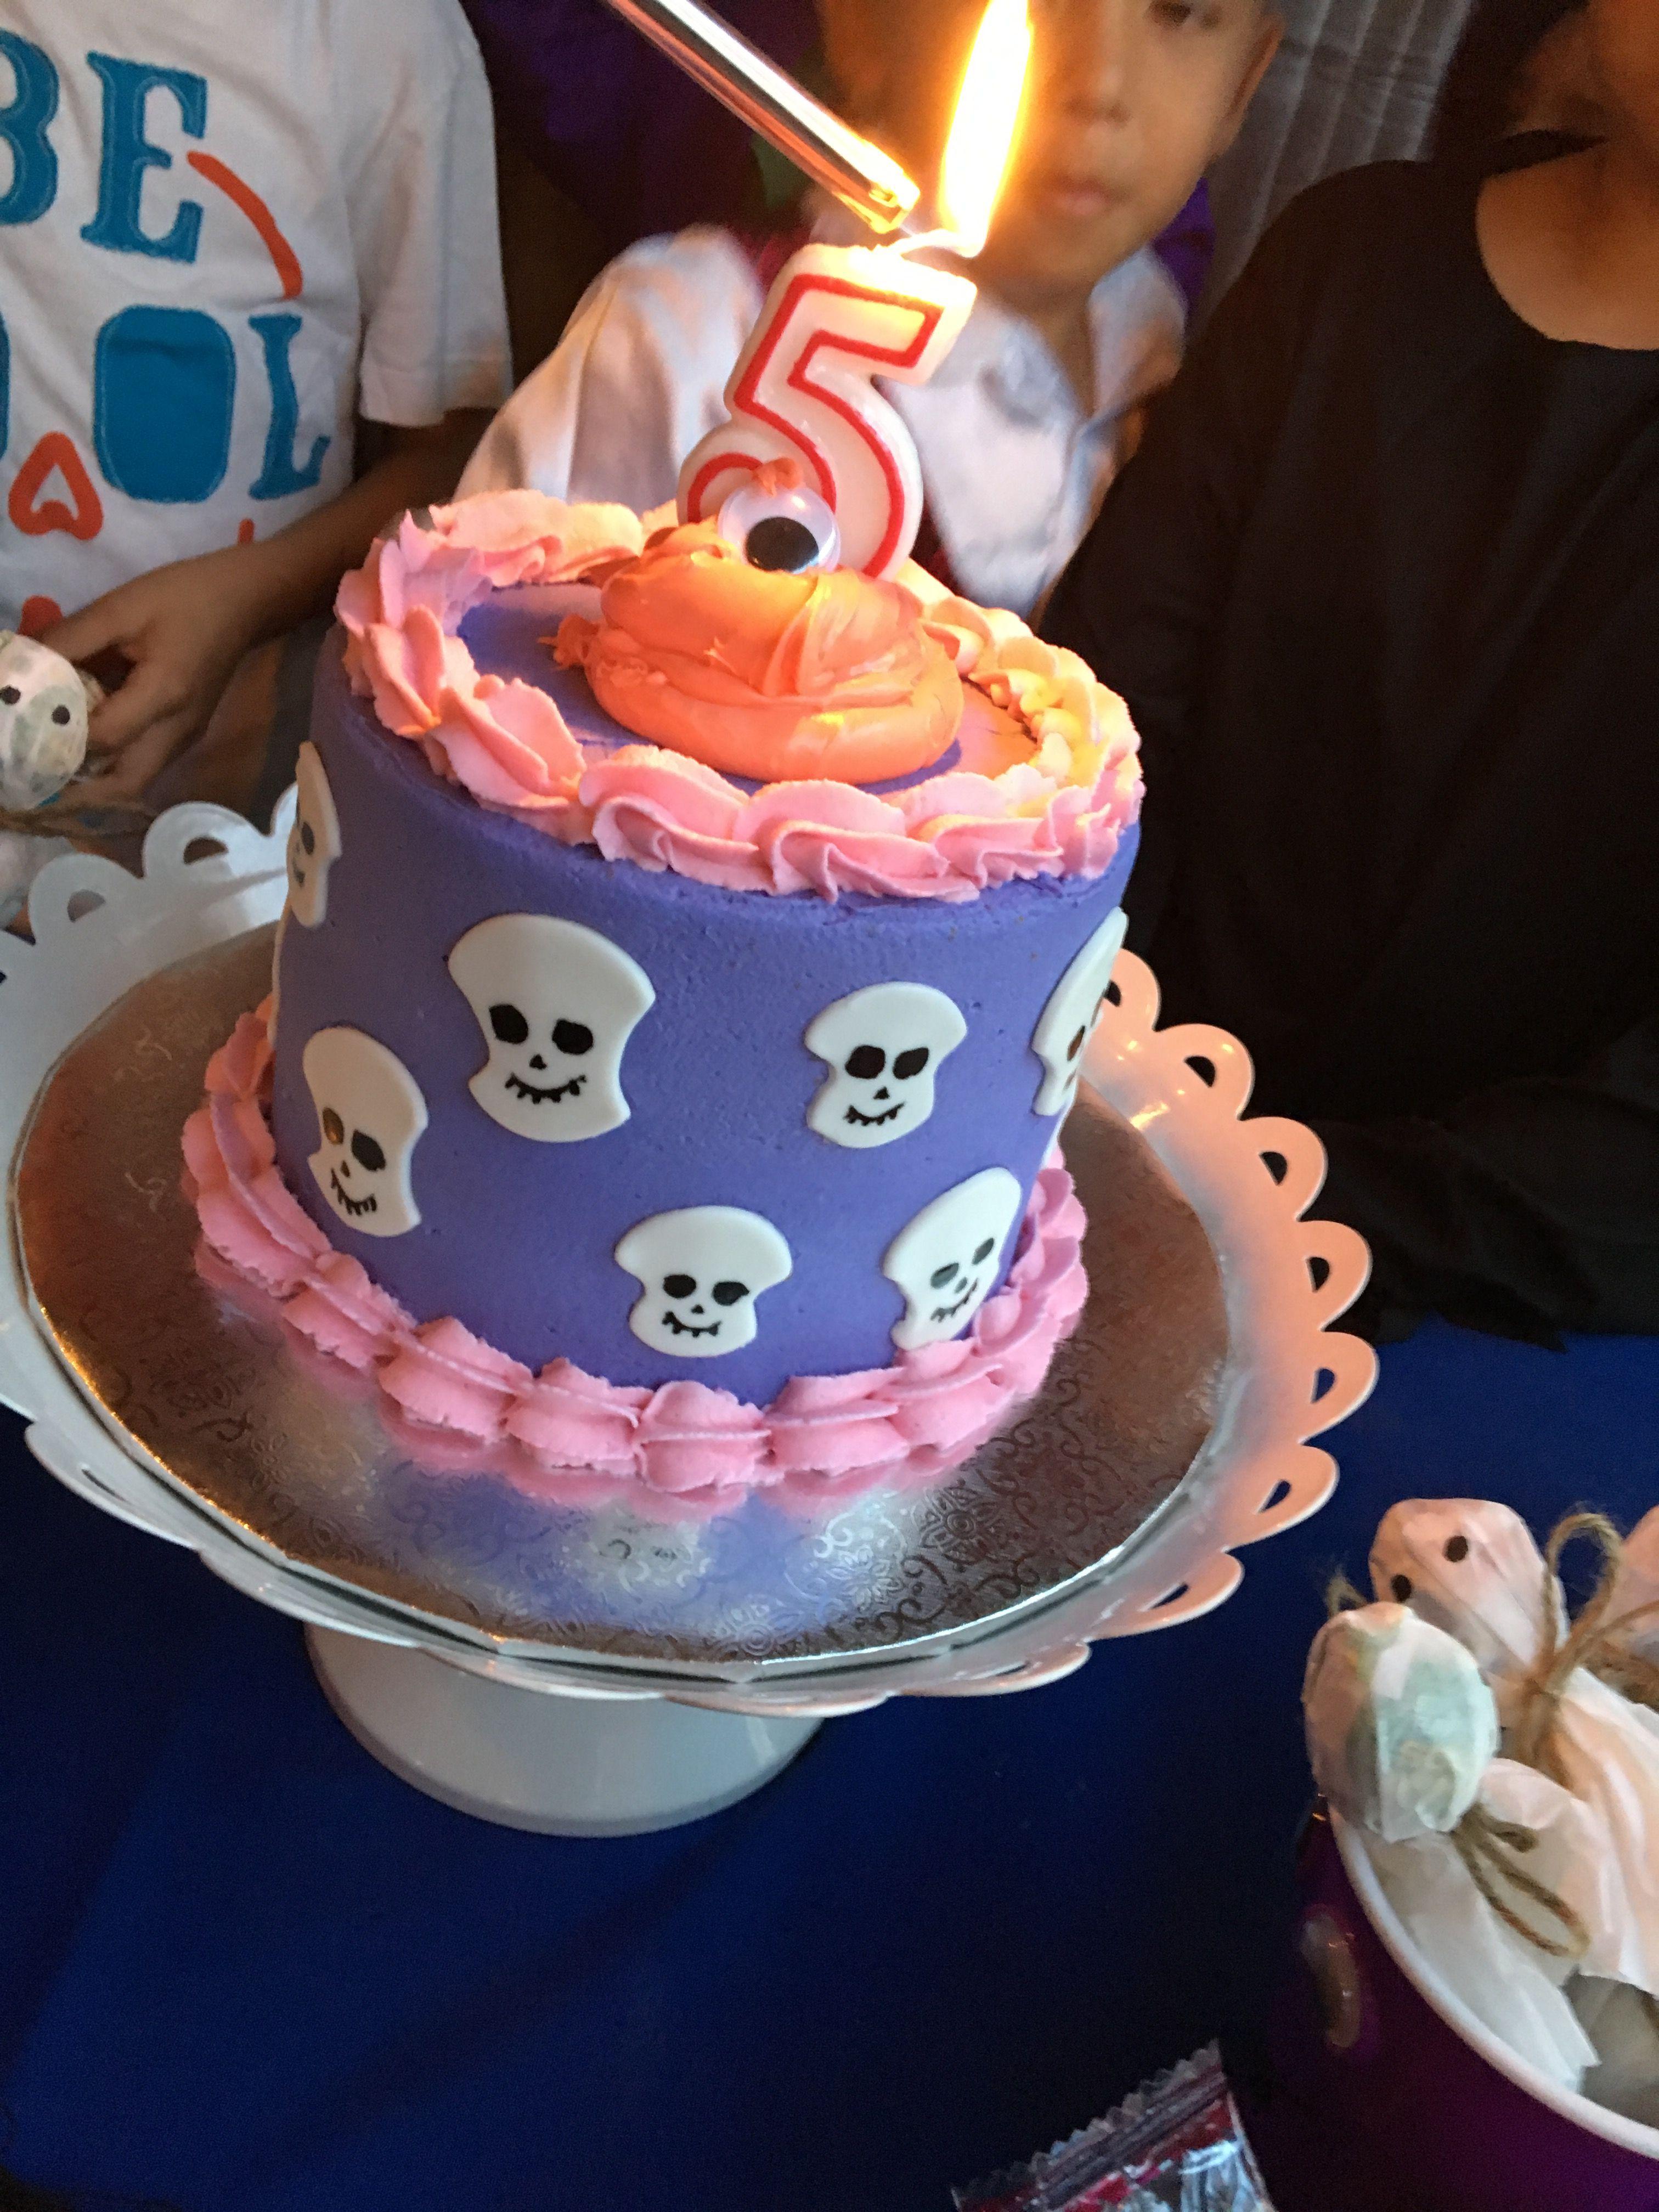 Dennis' Birthday Cake Hotel Transylvania Party